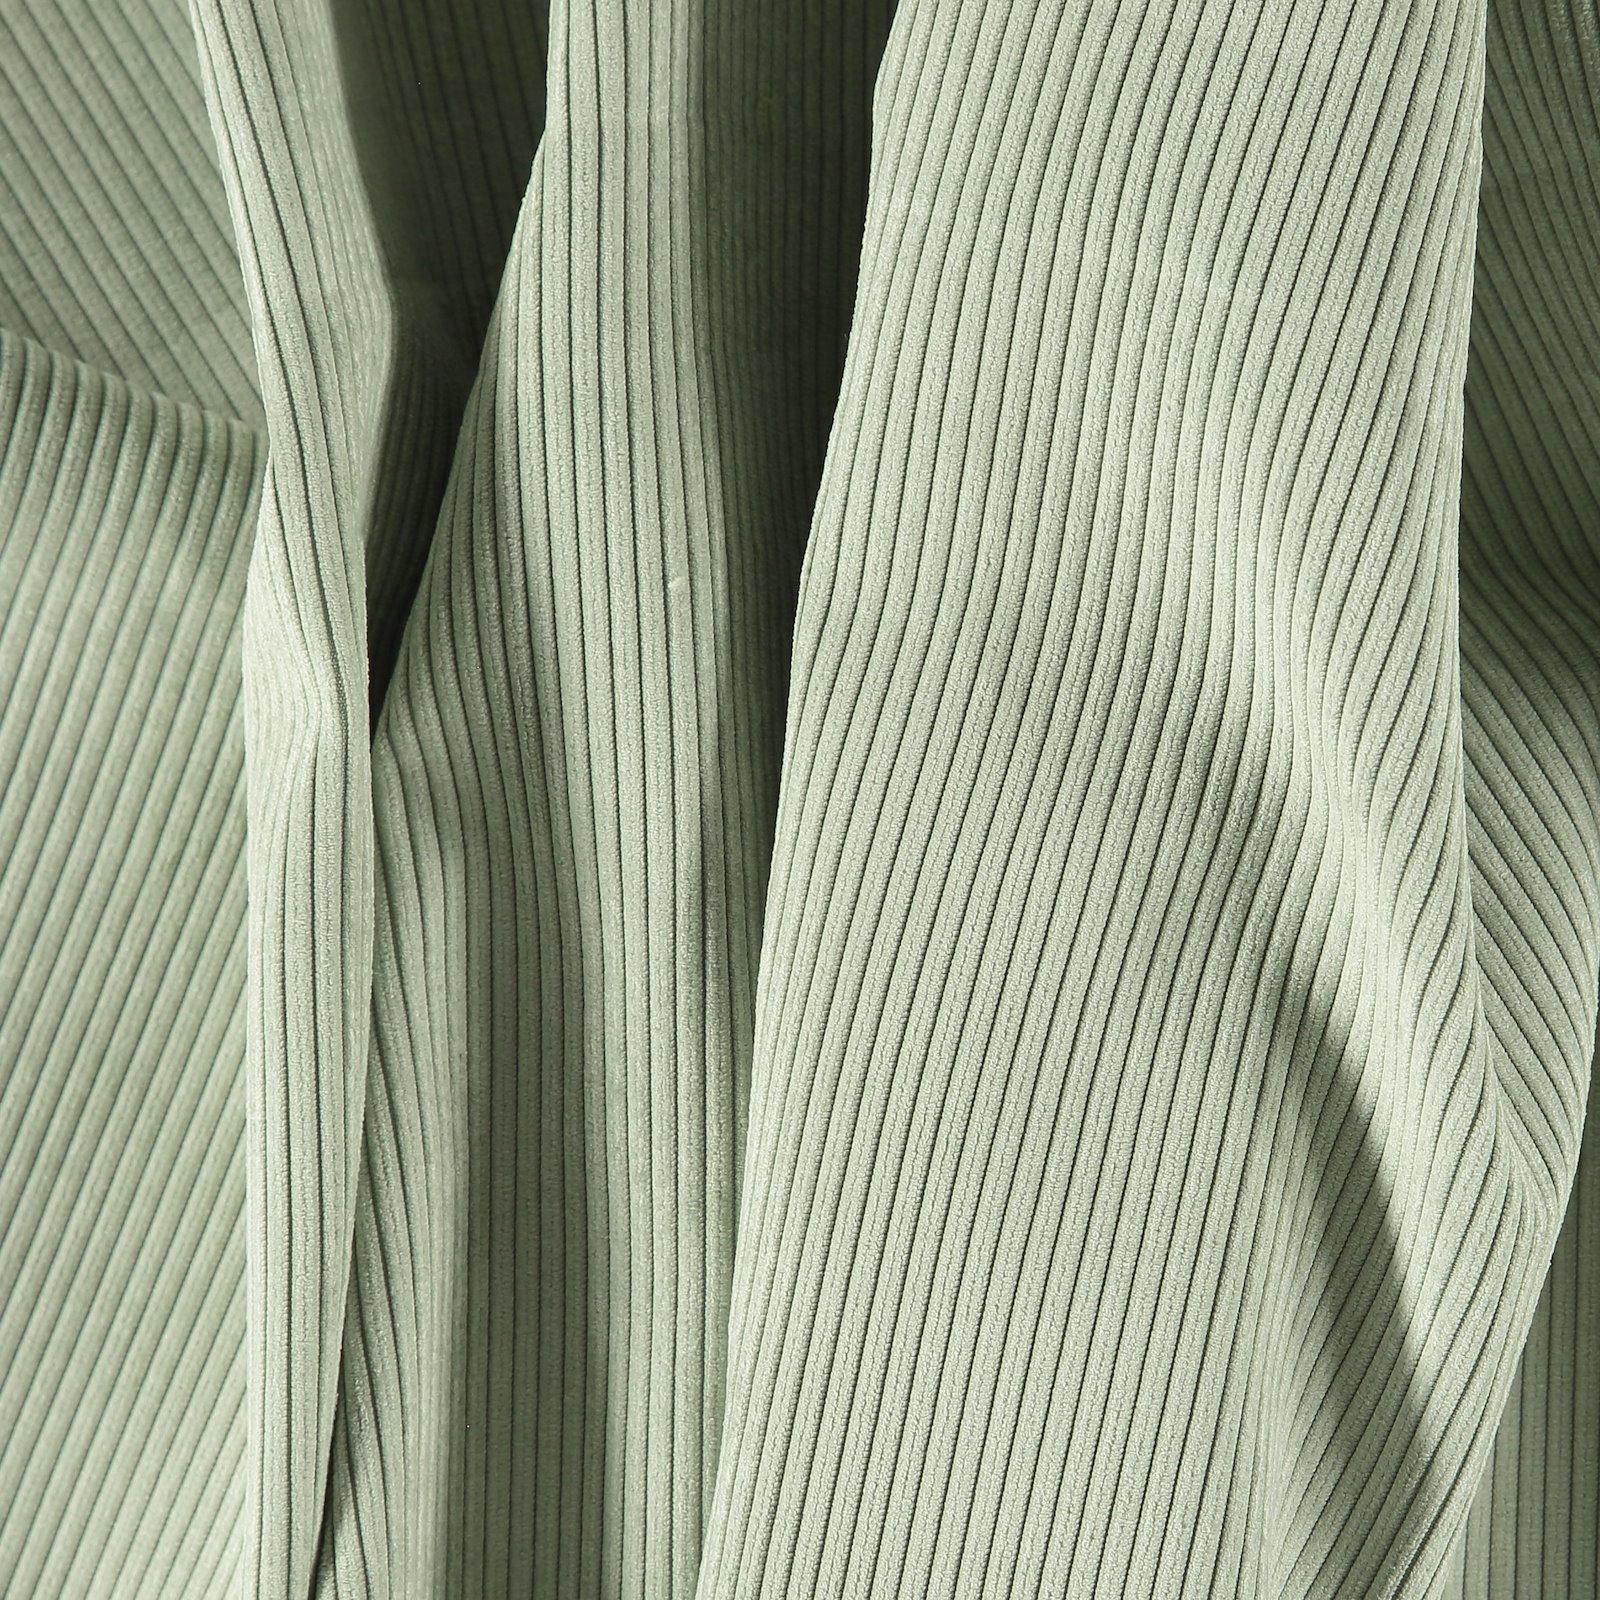 Upholstery corduroy 6 wales light sage